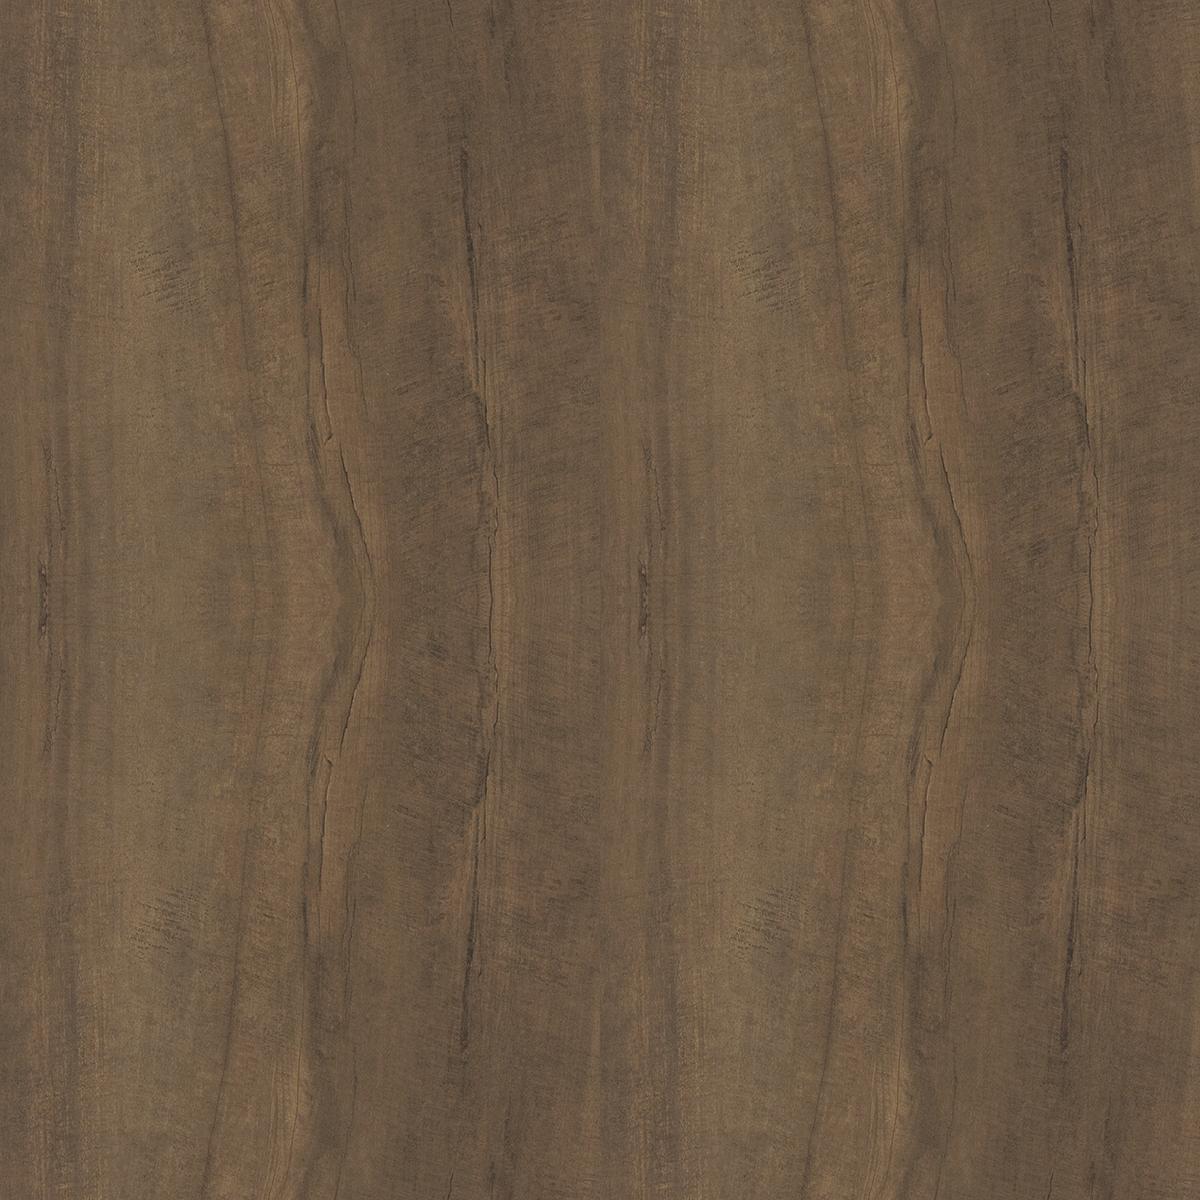 9484 Oxidized Beamwood - Formica